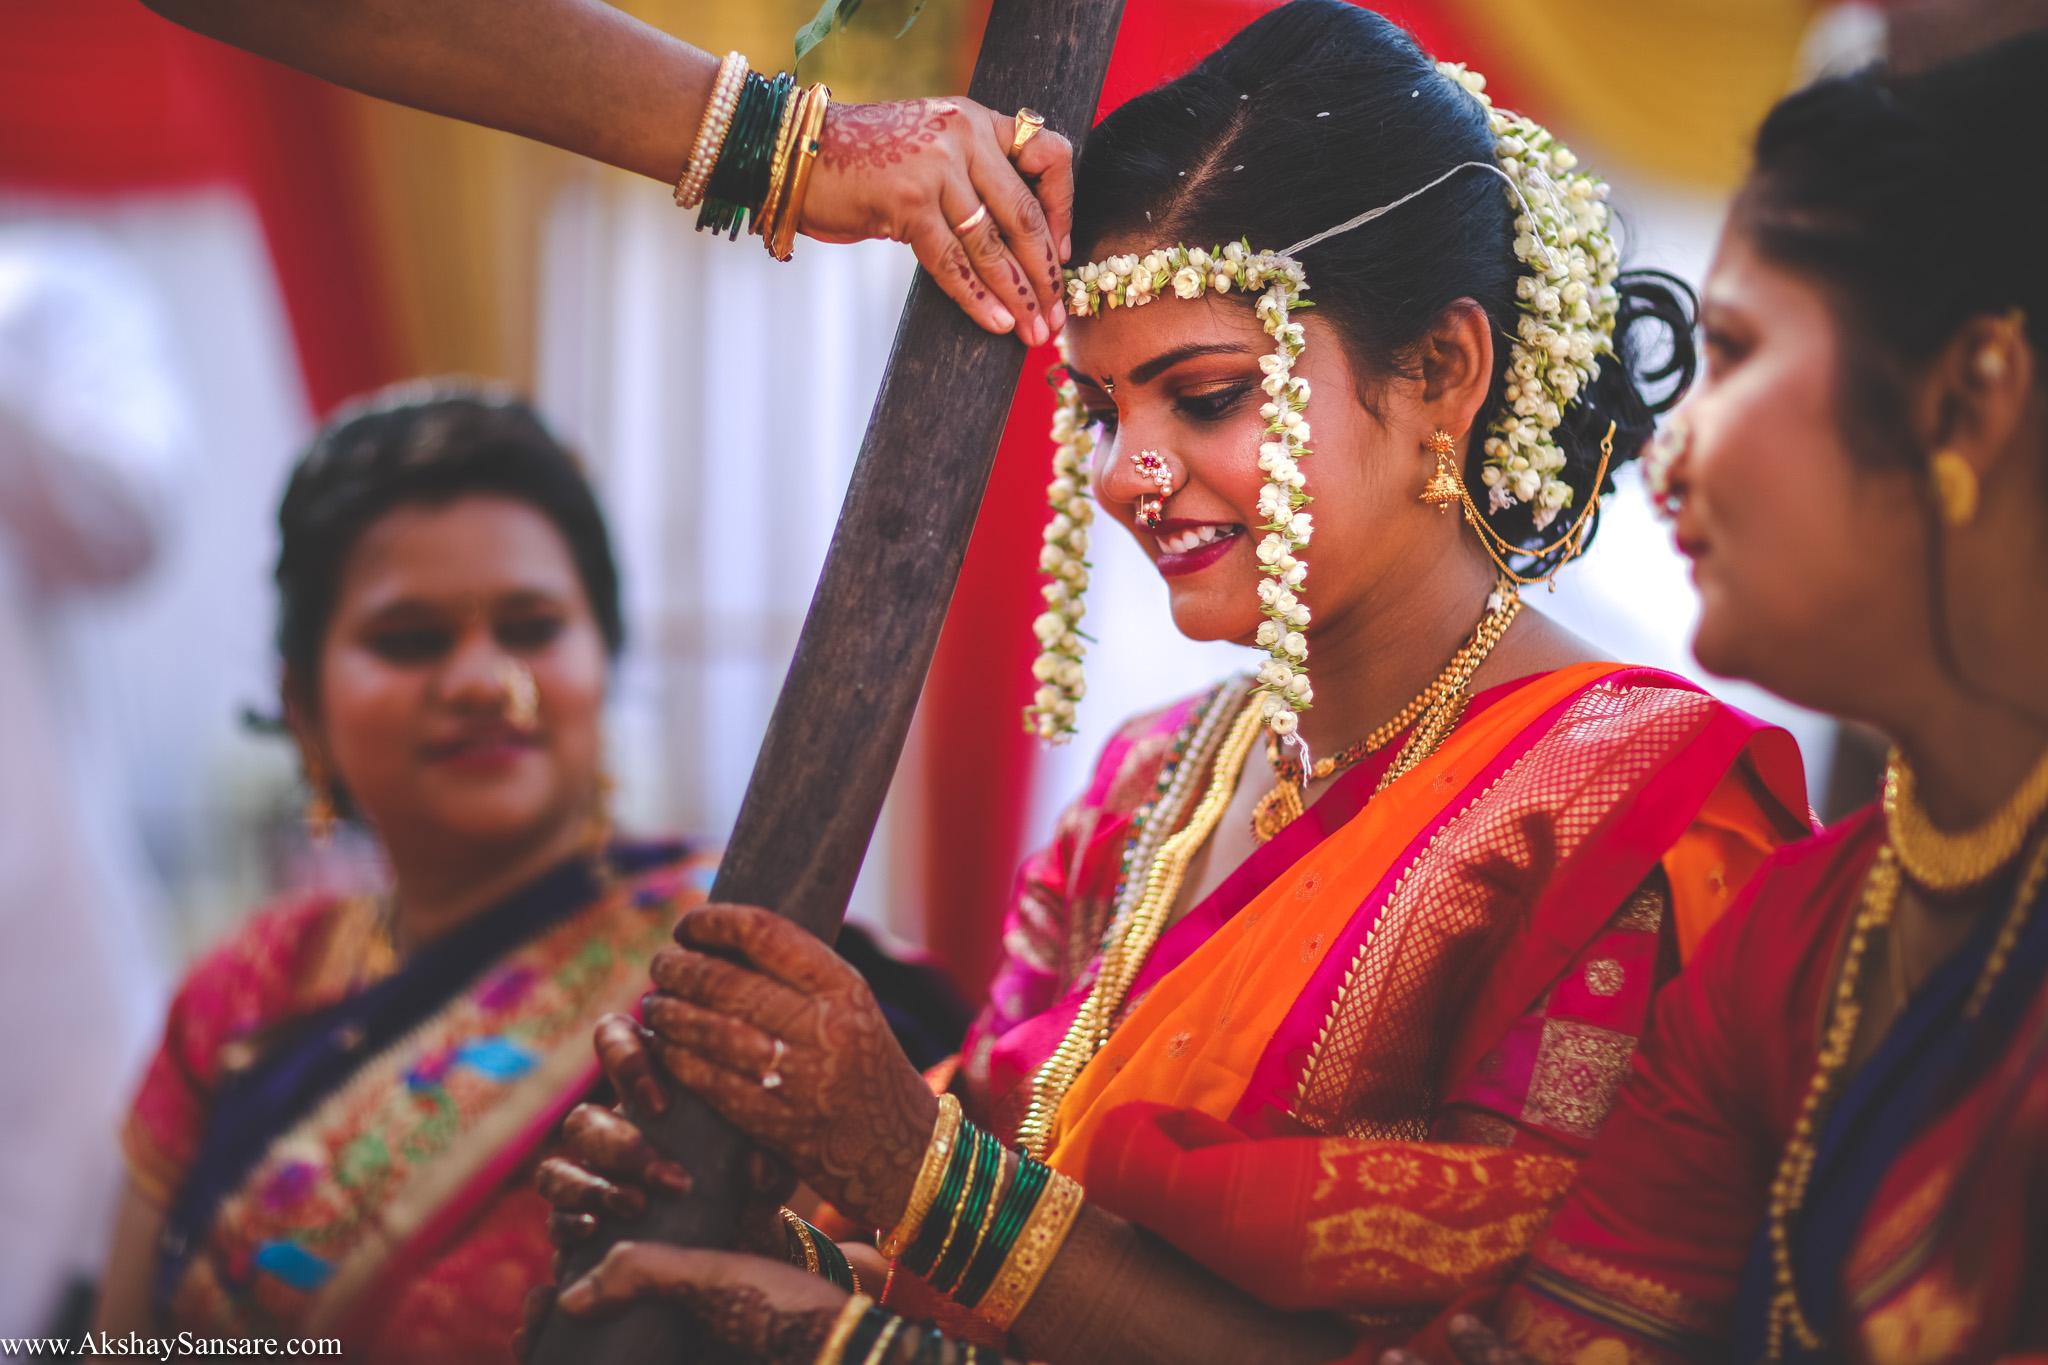 Salil x Kimaya Akshay Sansare Photography Candid wedding Photographer in mumbai best(9).jpg